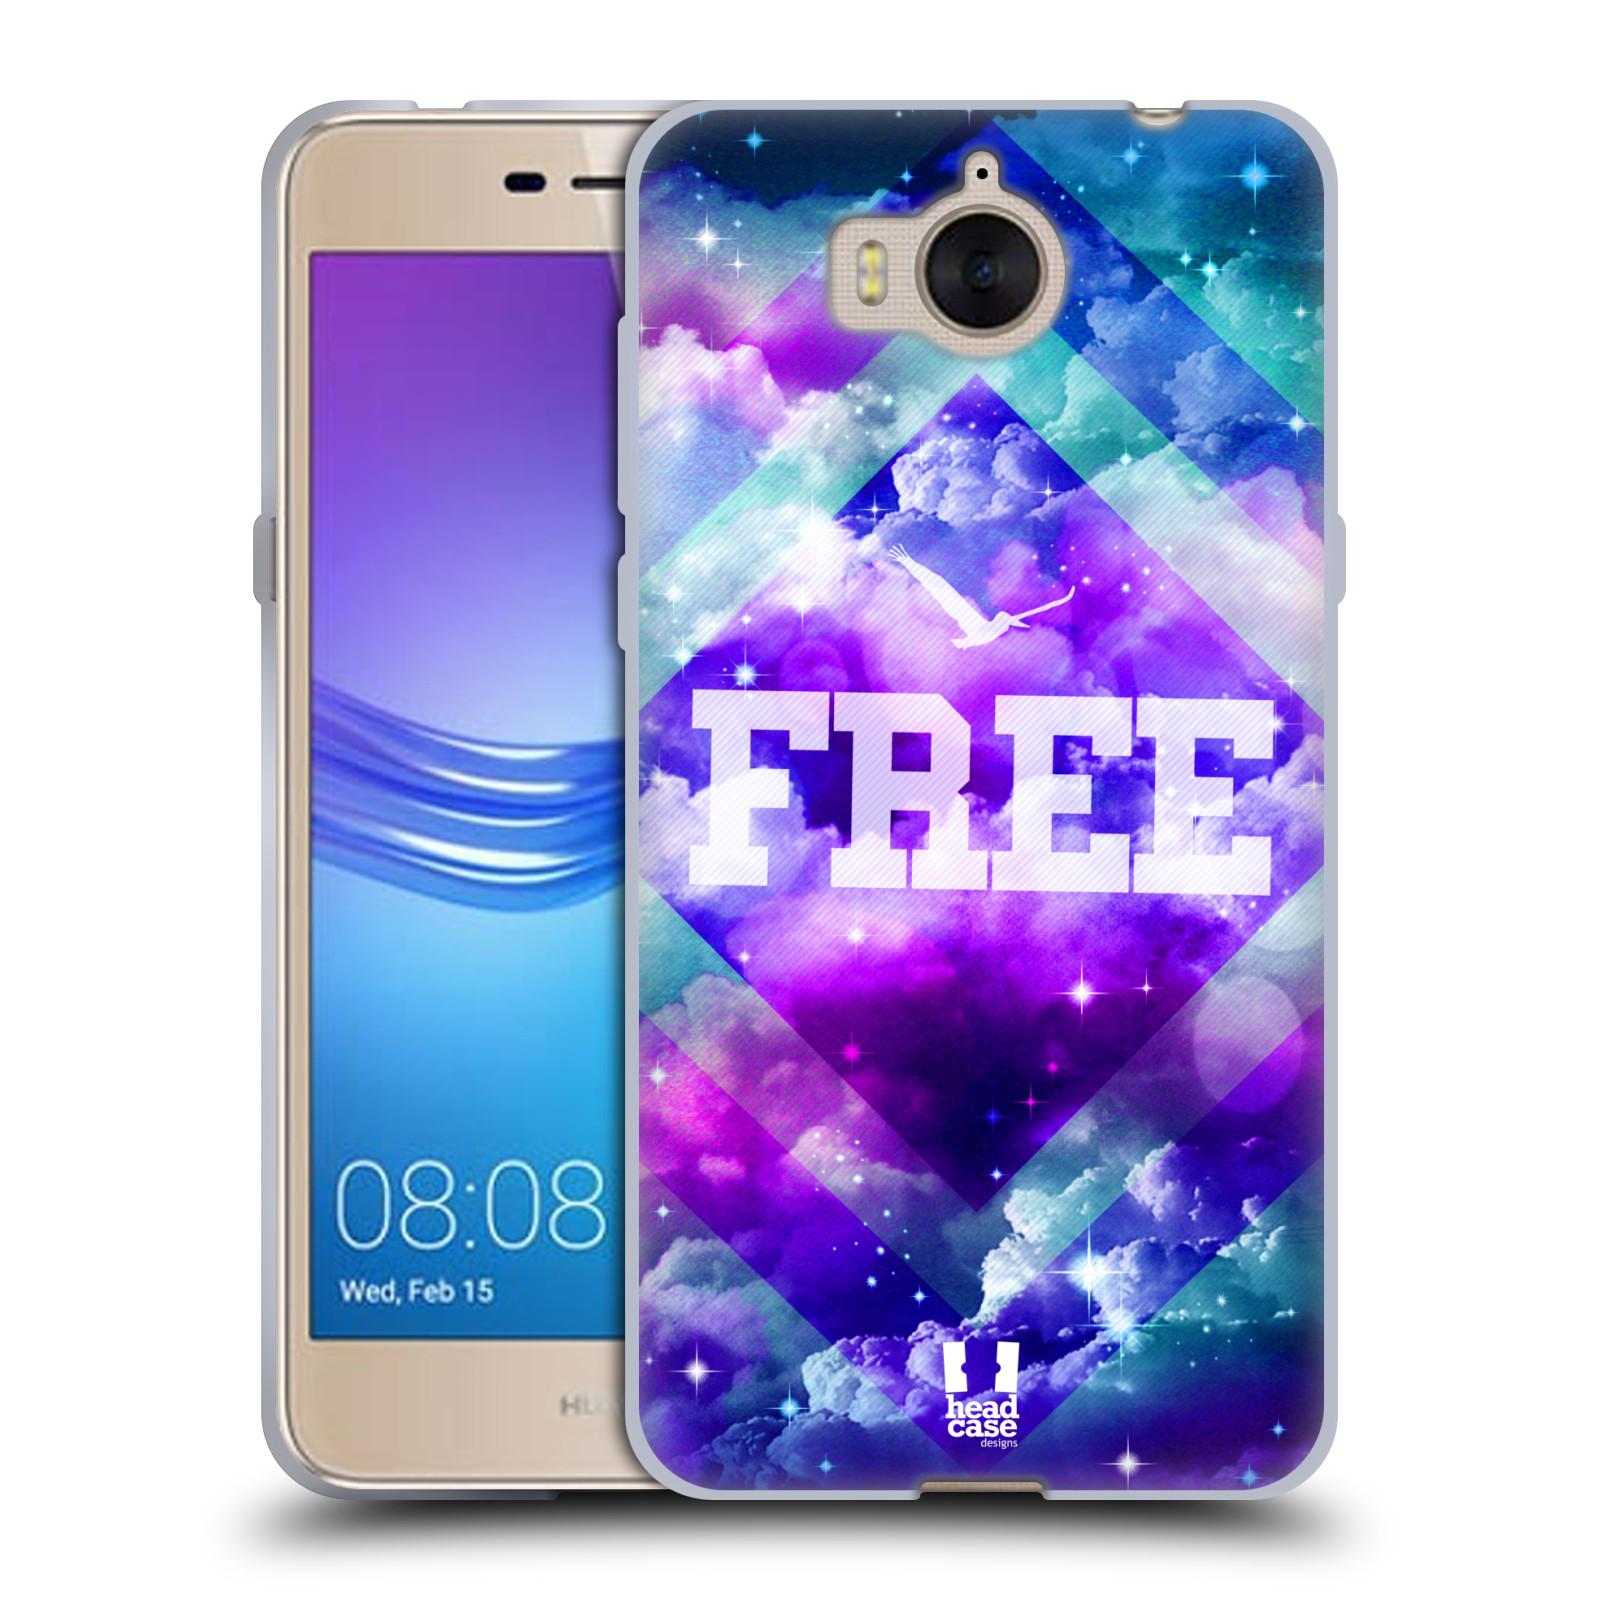 Silikonové pouzdro na mobil Huawei Y6 2017 - Head Case - CHROMATIC FREE